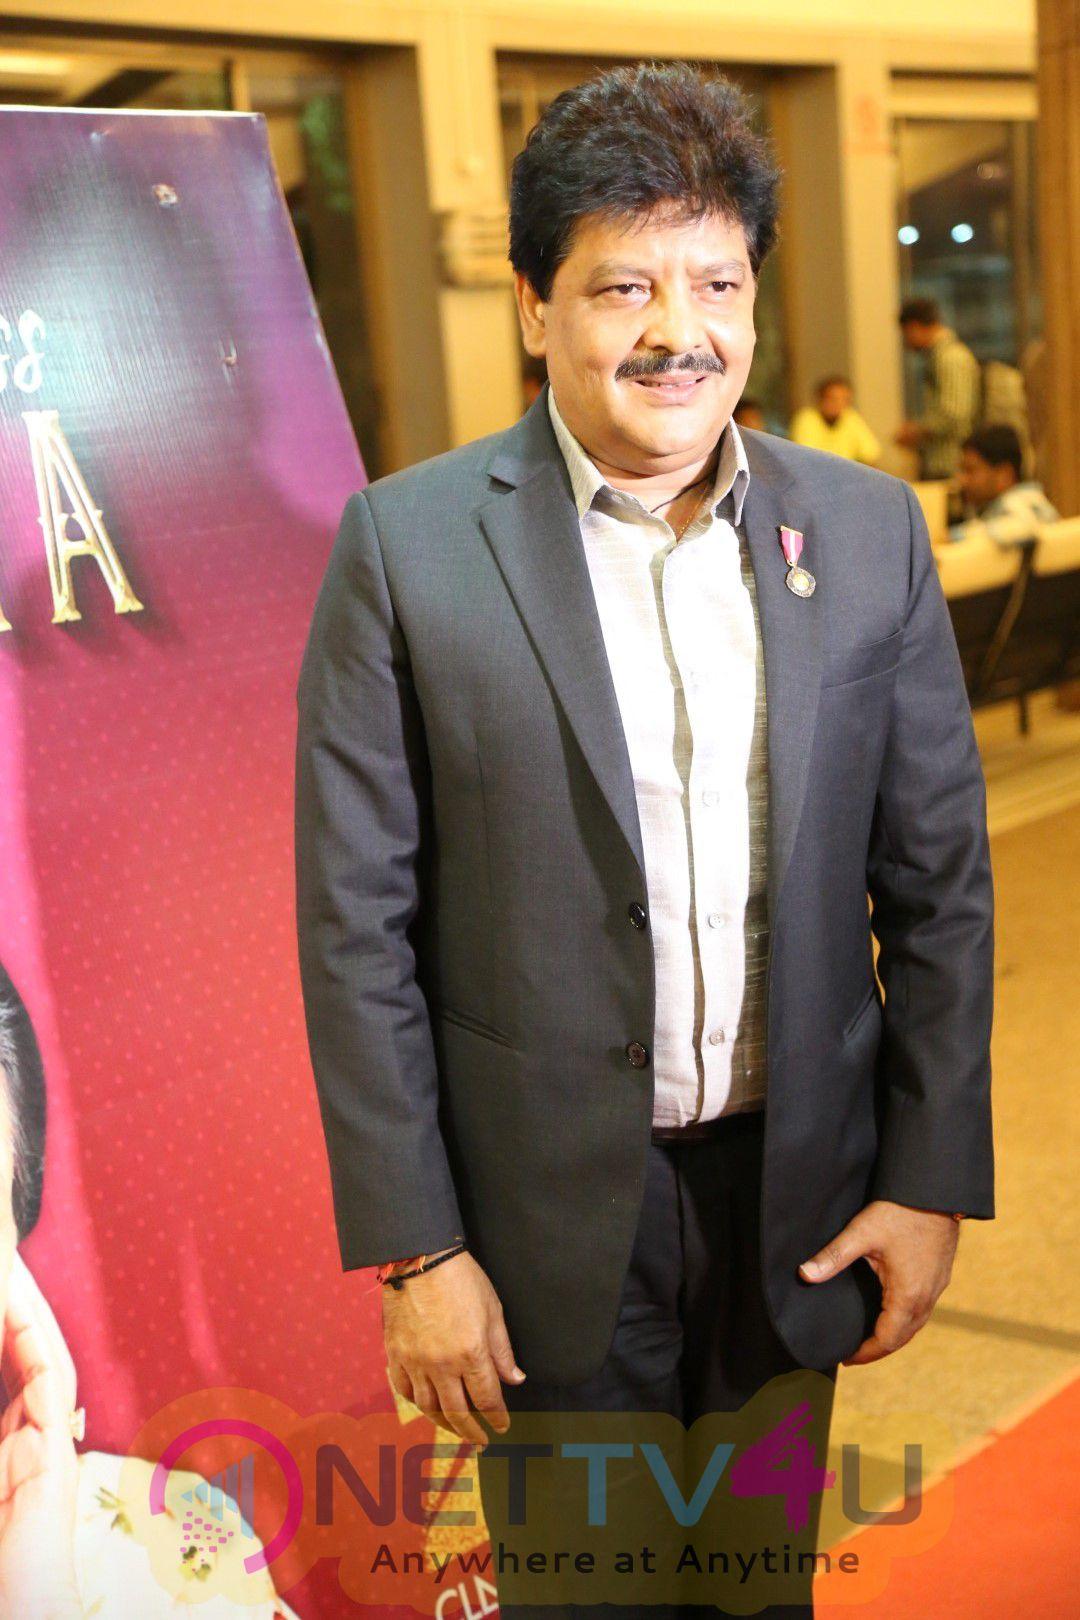 Zee Classic Celebrate Asha Bhosle 83rd Birthday A Musical Concert Timeless Asha Pics Hindi Gallery